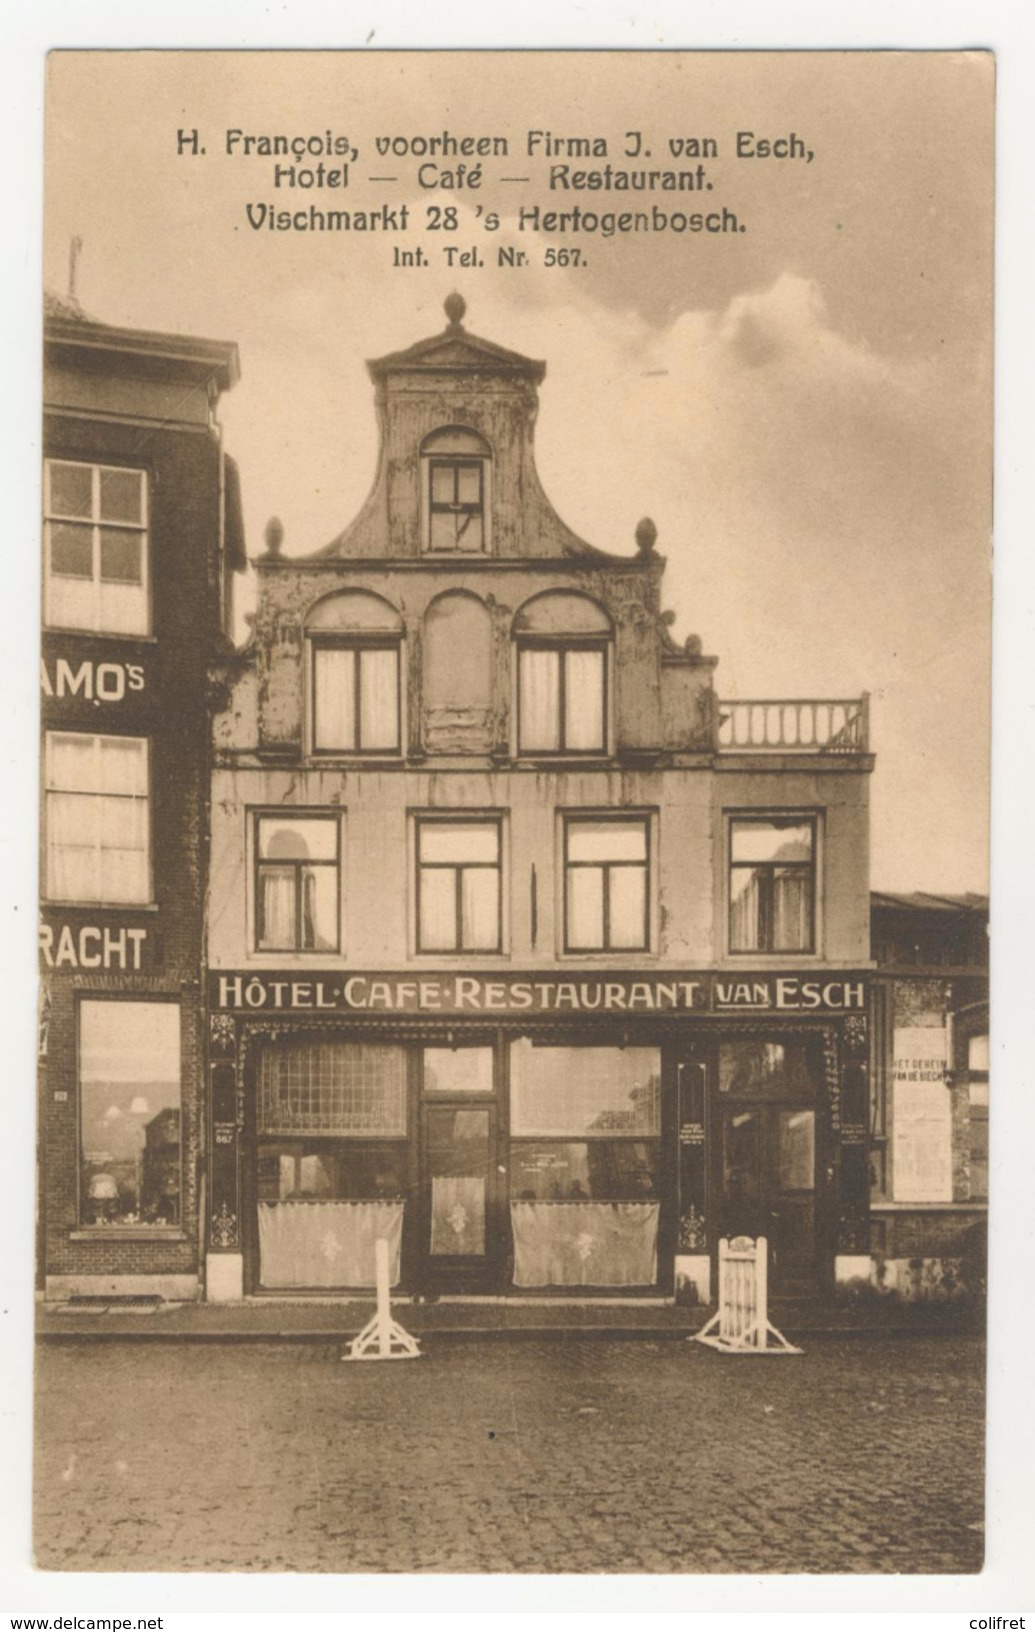 Noord-Brabant          S Hertogenbosch            Hôtel - Café - Restaurant        Vischmarkt 28 - 's-Hertogenbosch